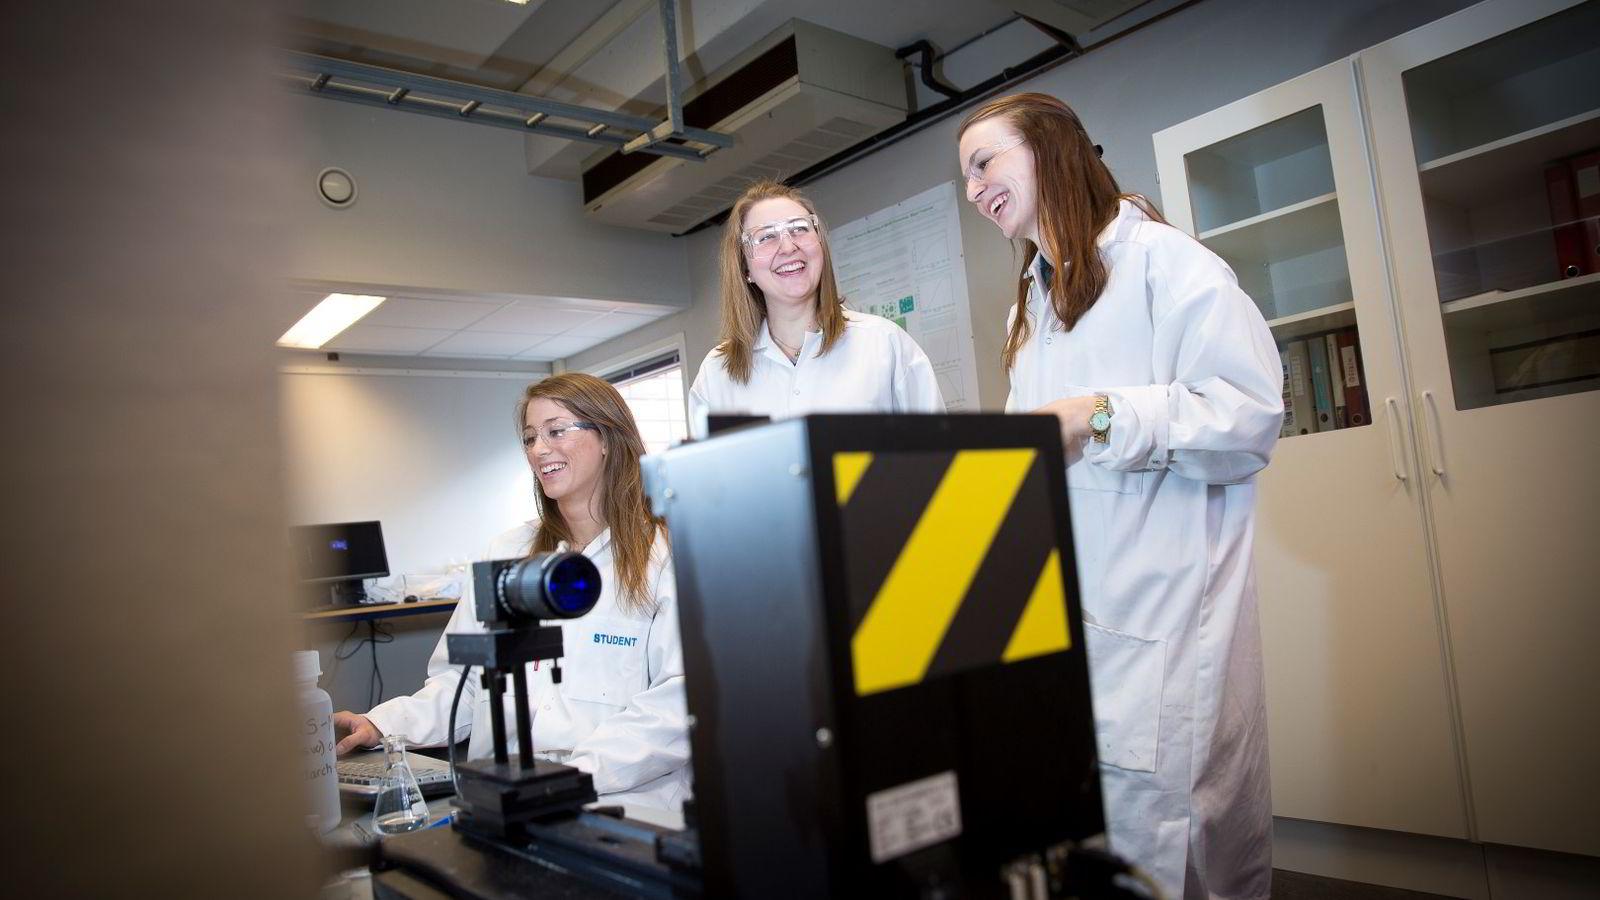 Amanda Bjøringsøy(f.v.), Britt Lunde Raftevold og Helene Virkesdal Daae studerer petroleumsfag ved NTNU. Ingeniørfagene i Trondheim har en stadig høyere kvinneandel.